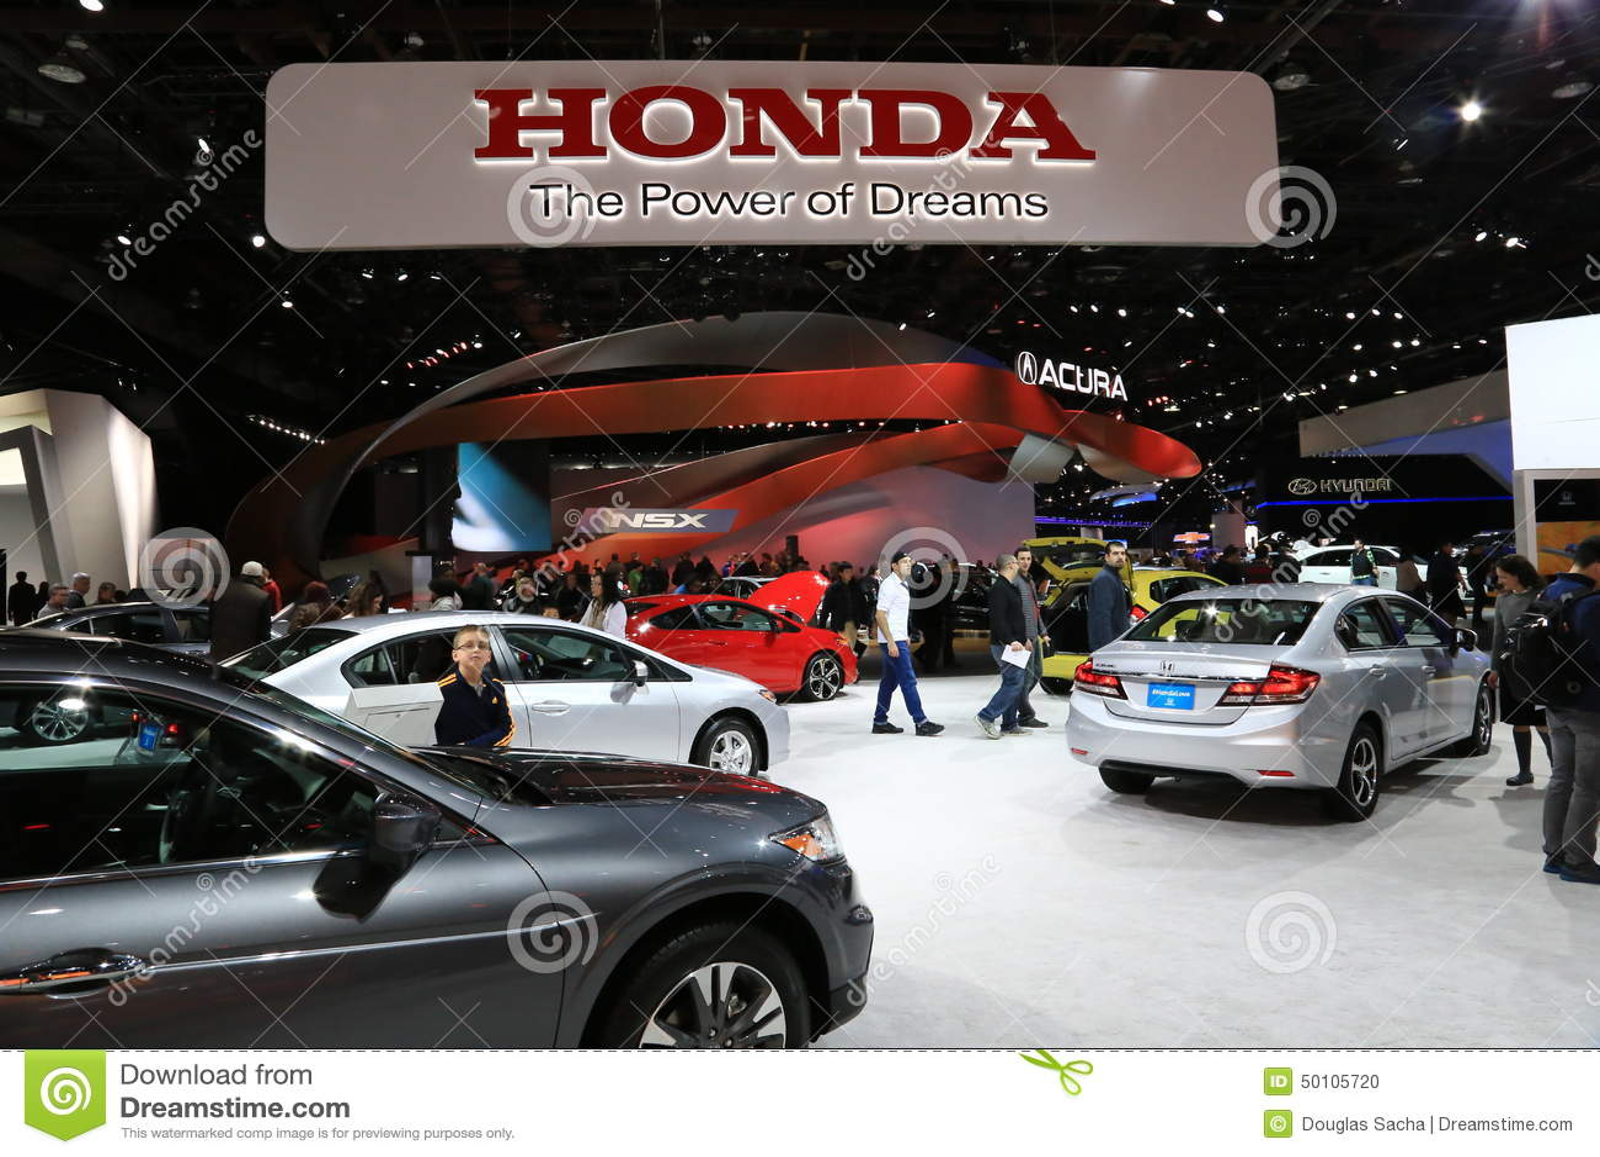 Honda Display At The Auto Show Editorial Image